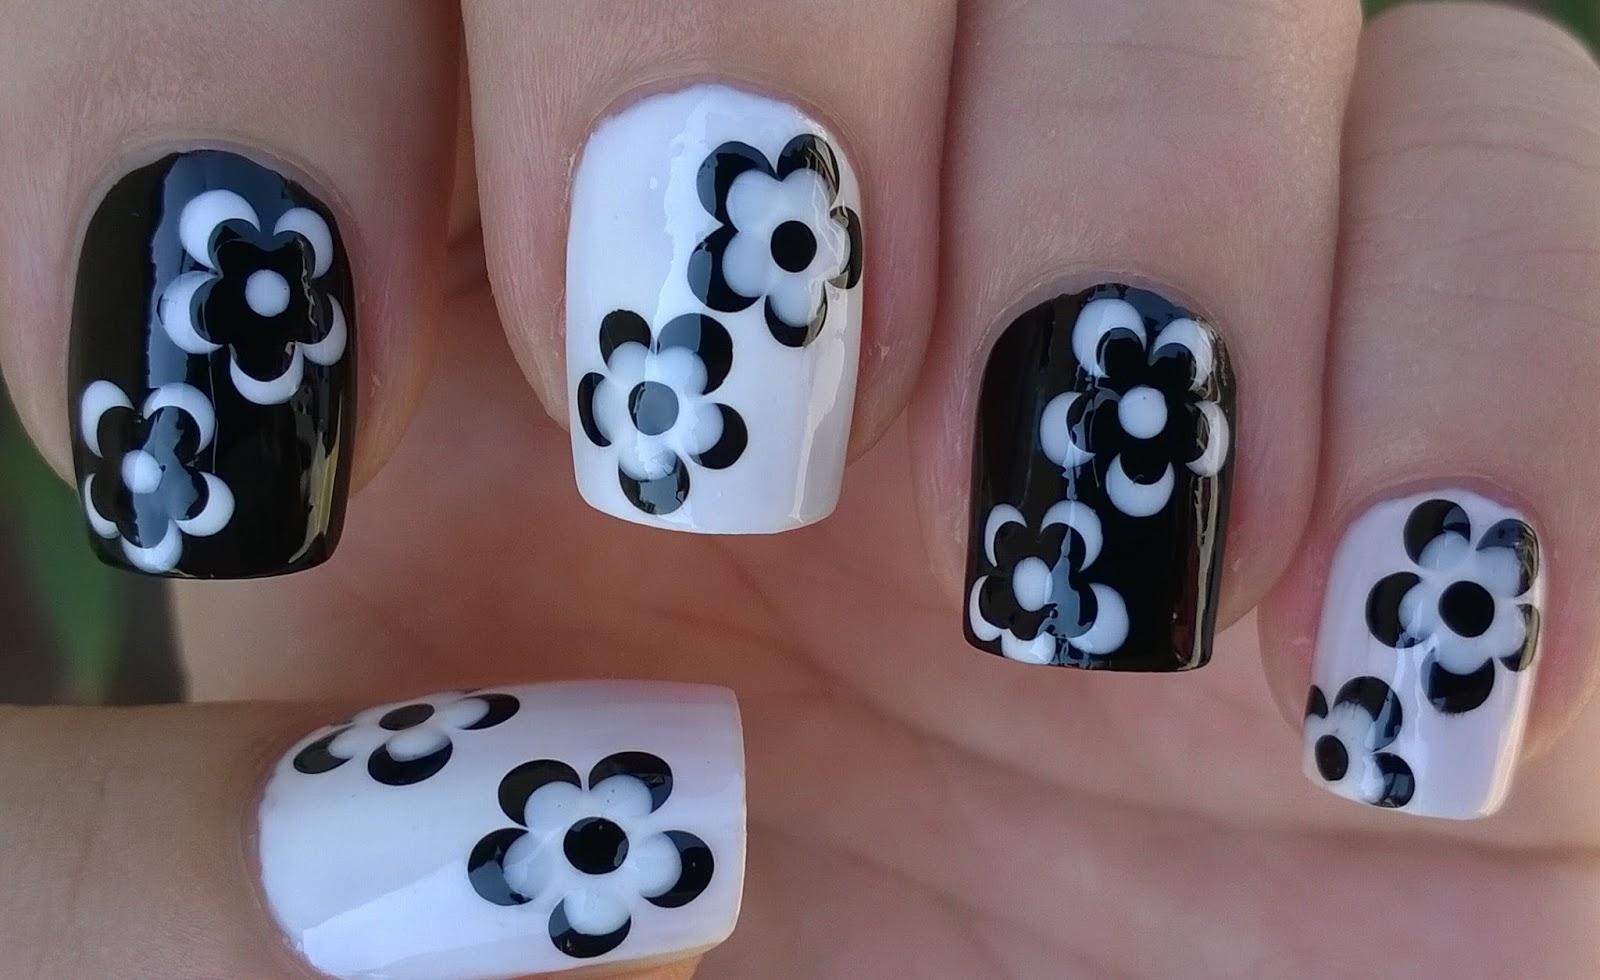 Life World Women Monochrome Floral Nail Art In Black White